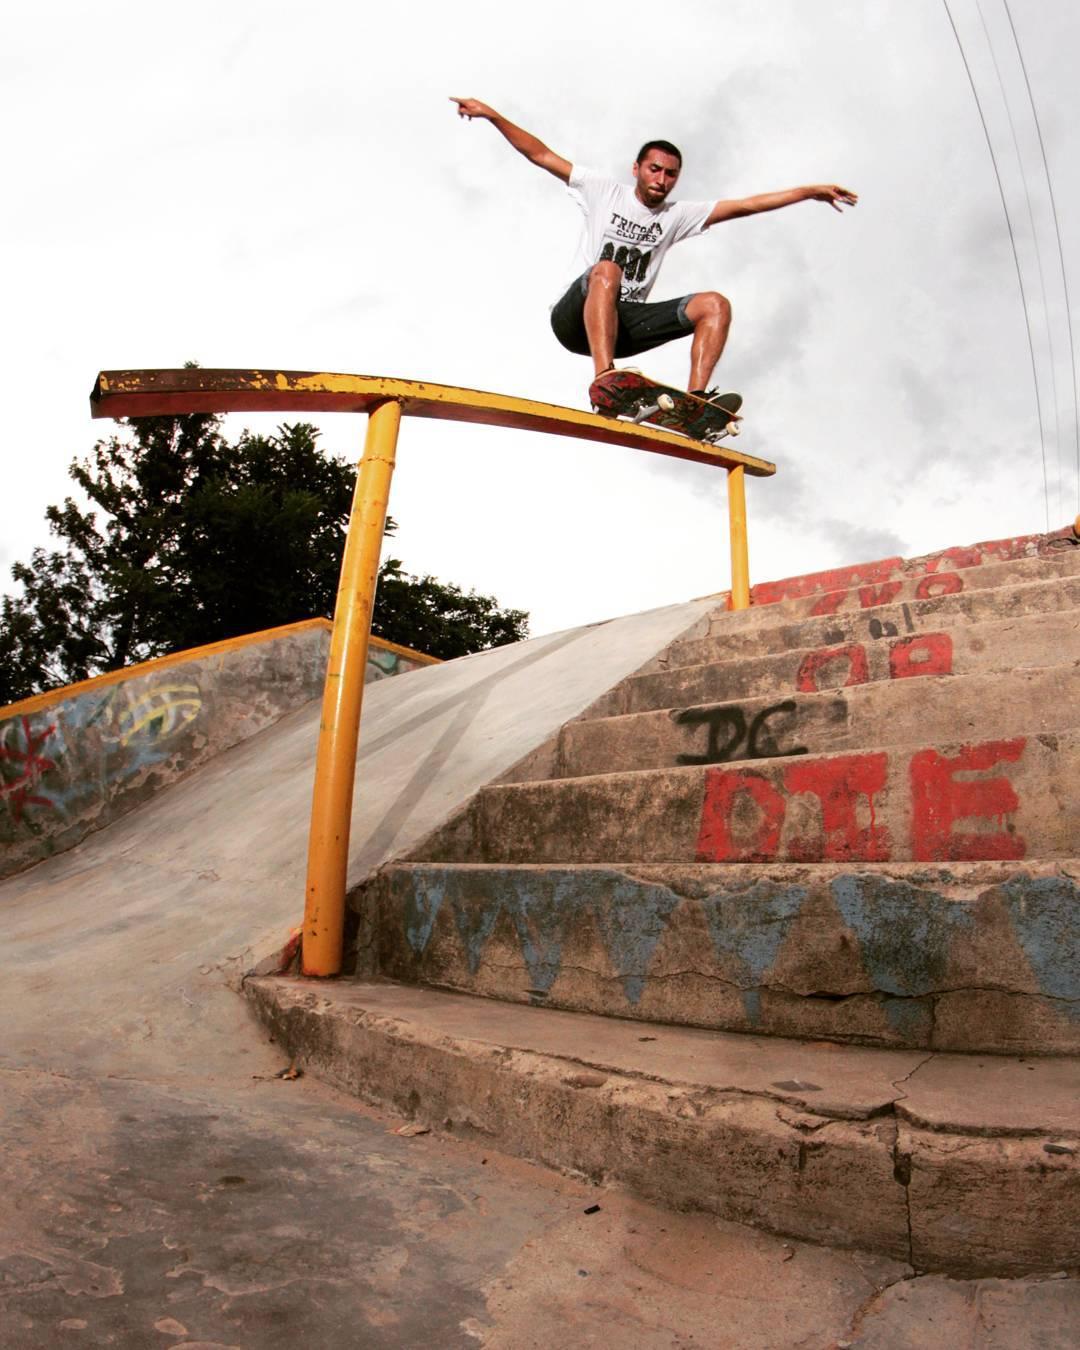 Para arrancar el 2016 Daniel Marquez nos manda esta Nollie 50-50 desde Tartagal